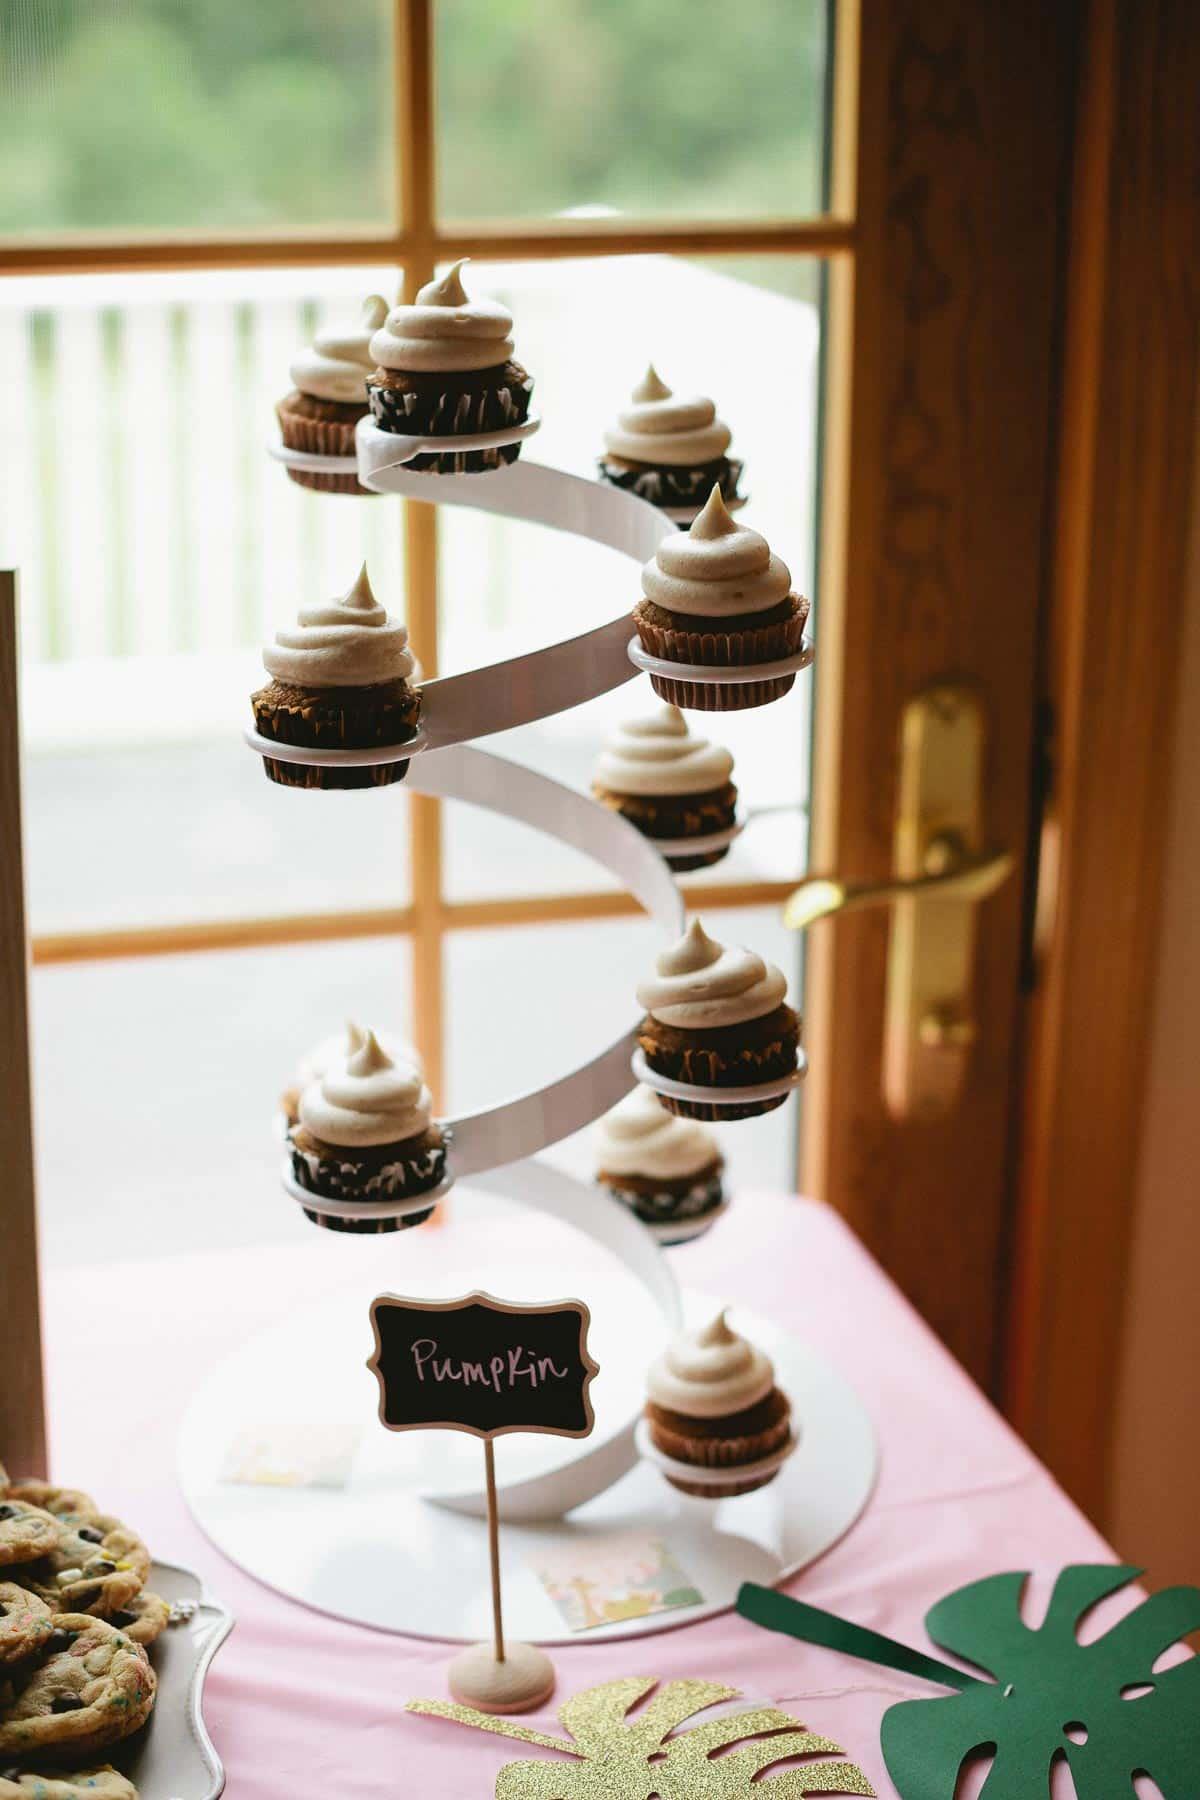 Pumpkin cupcakes for 1st birthday party on sallysbakingaddiction.com